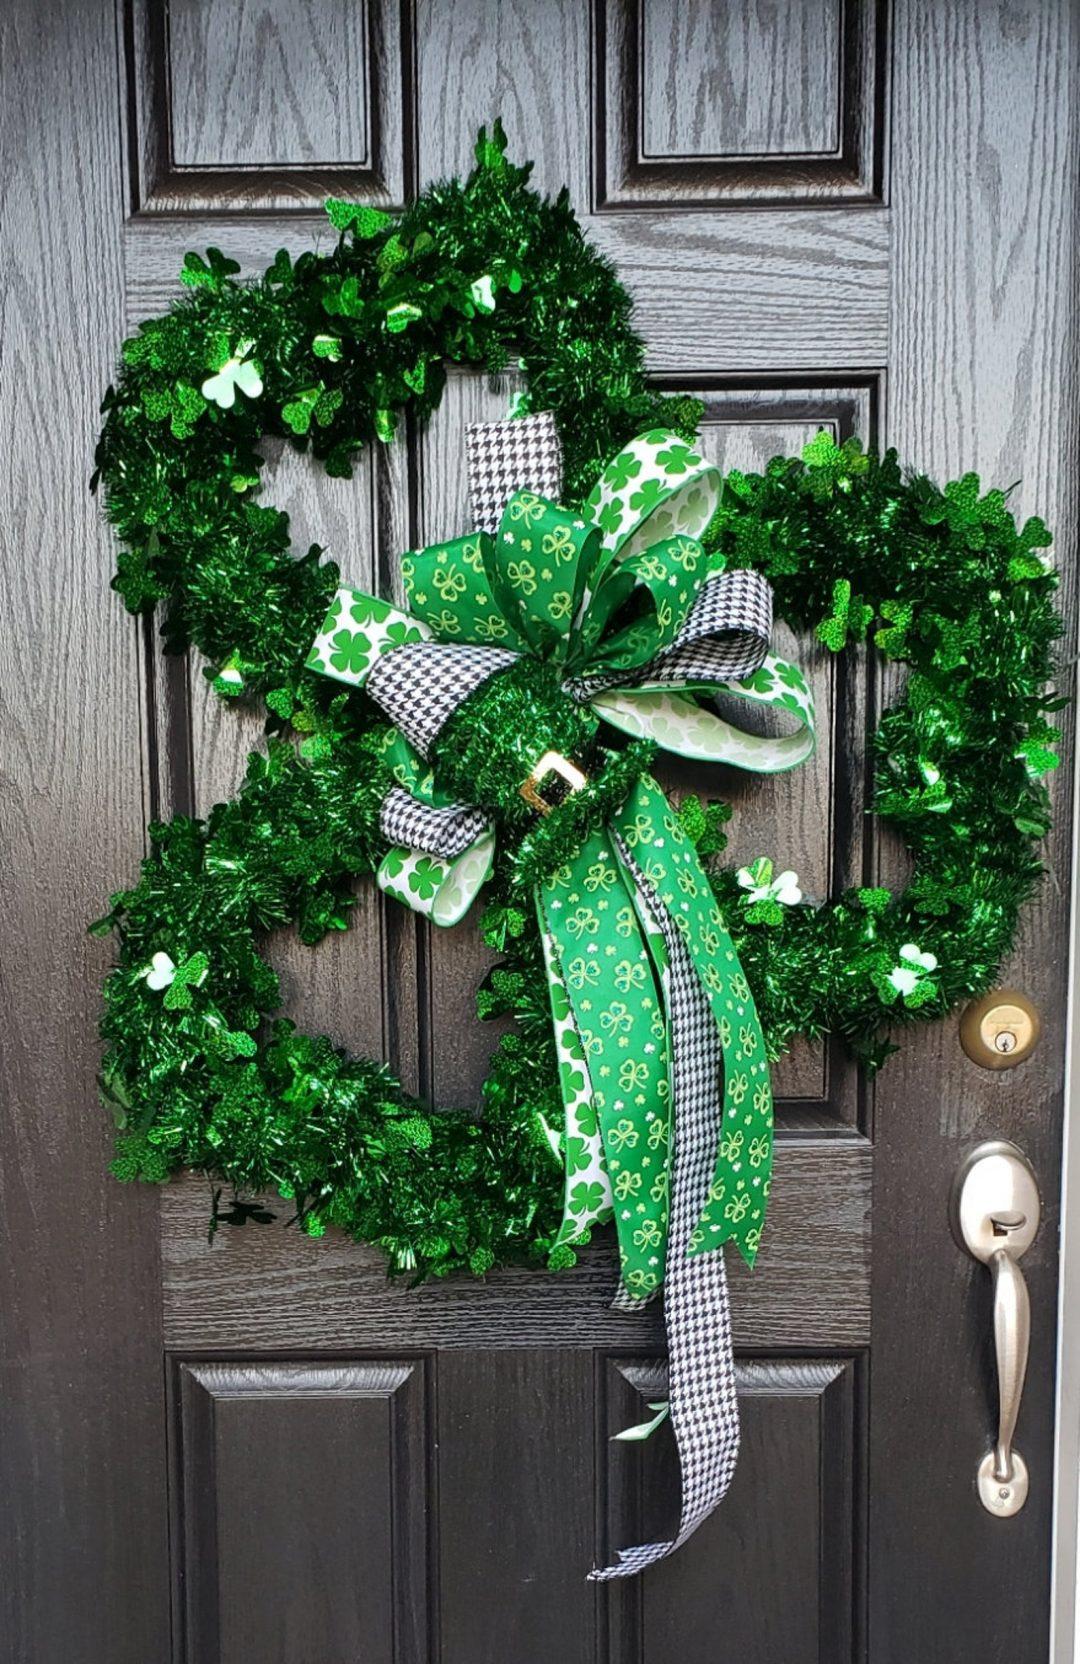 Green shamrock wreaths